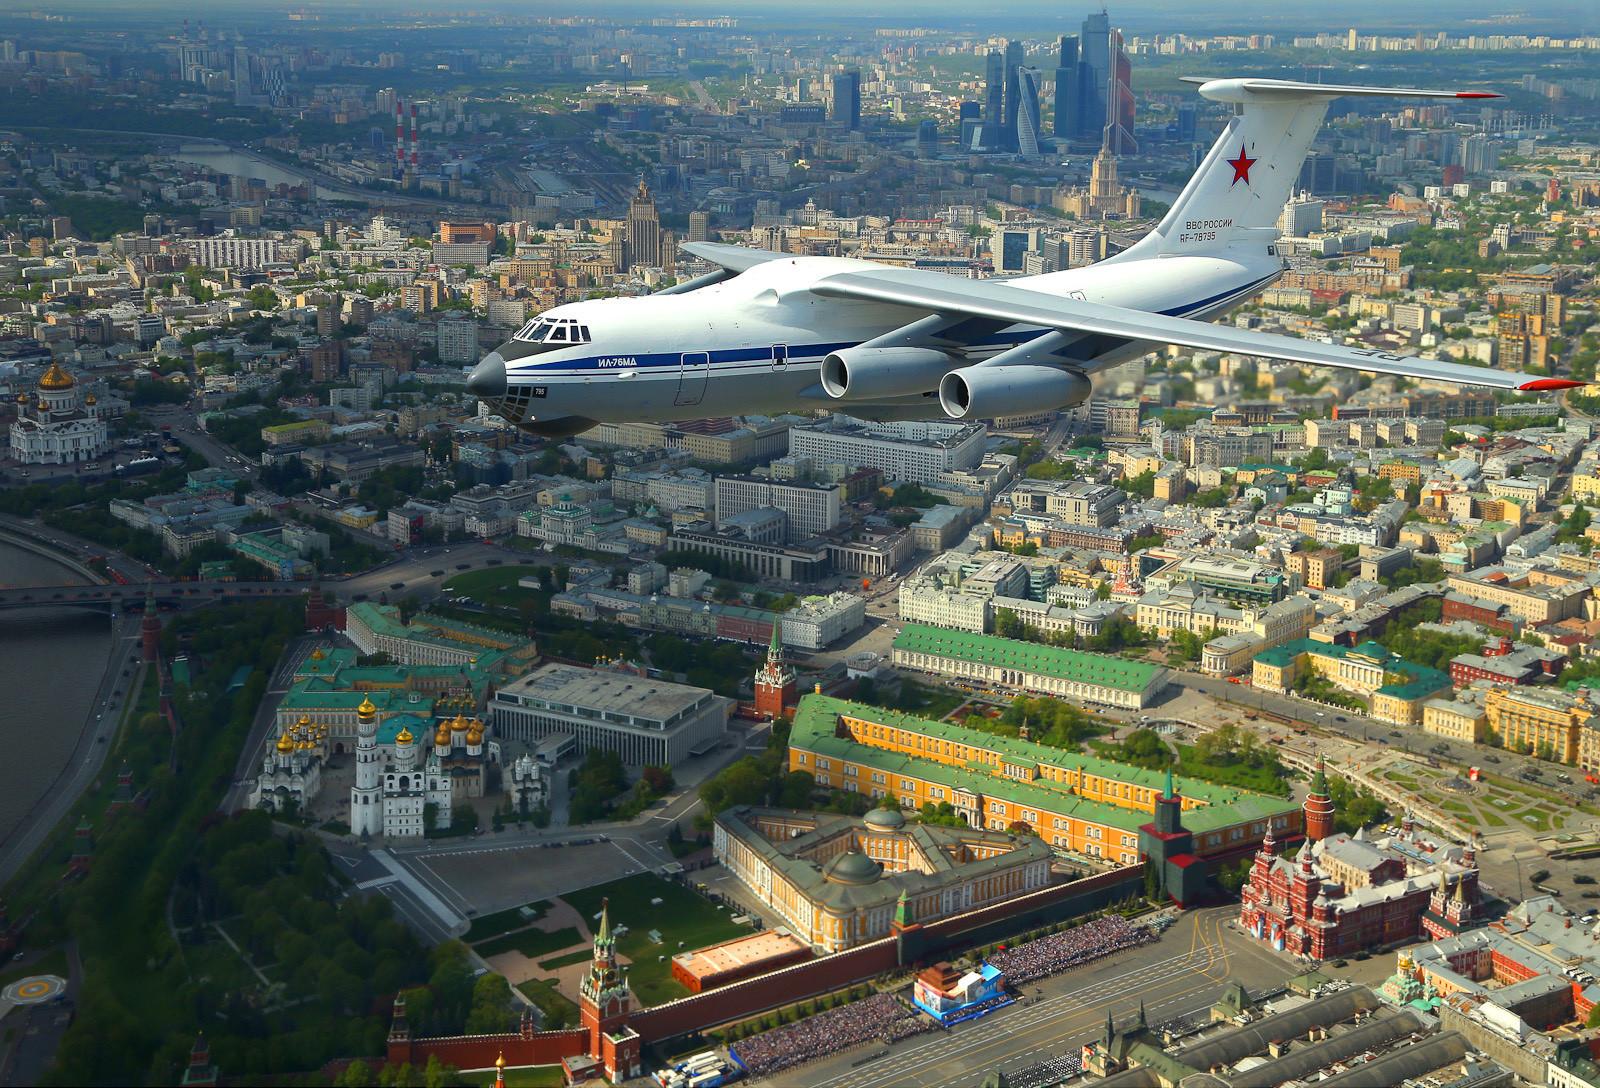 Cargueiro russo Ilyushin Il-76, de quatro motores, sobre o Kremlin